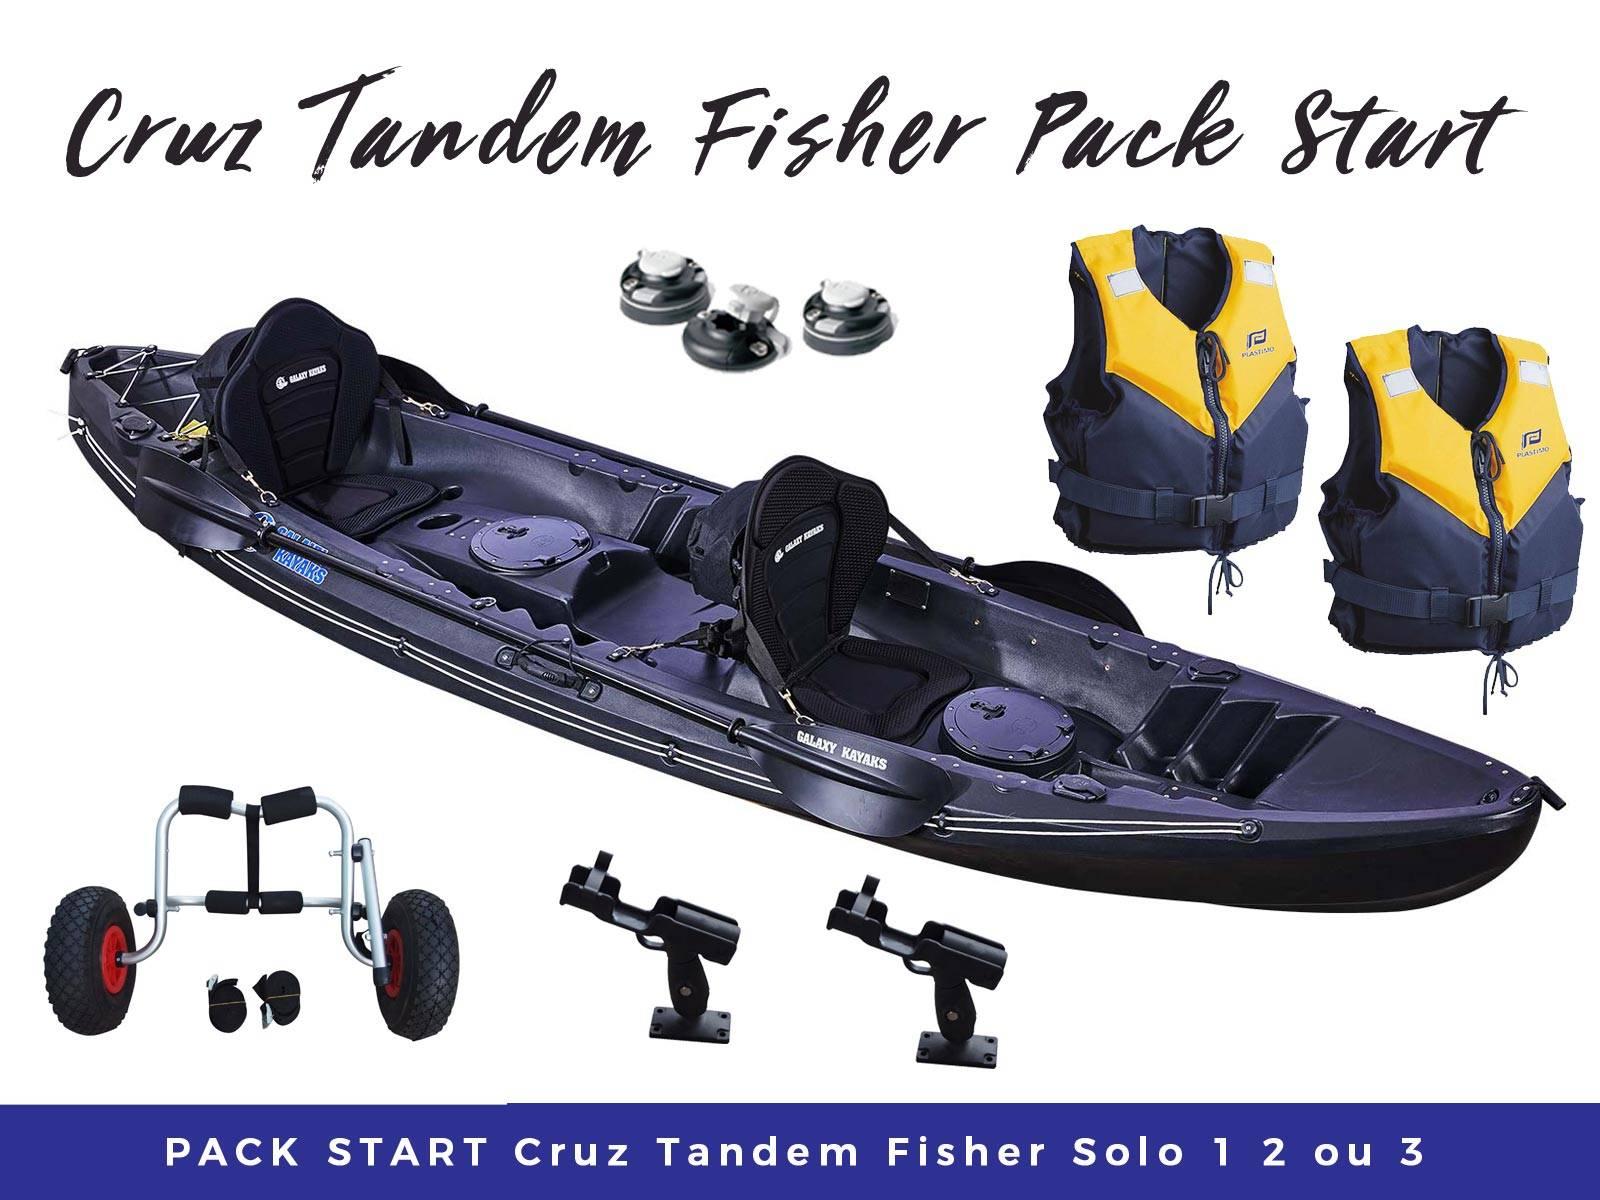 Pack start Cruz Tandem Fisher Solo